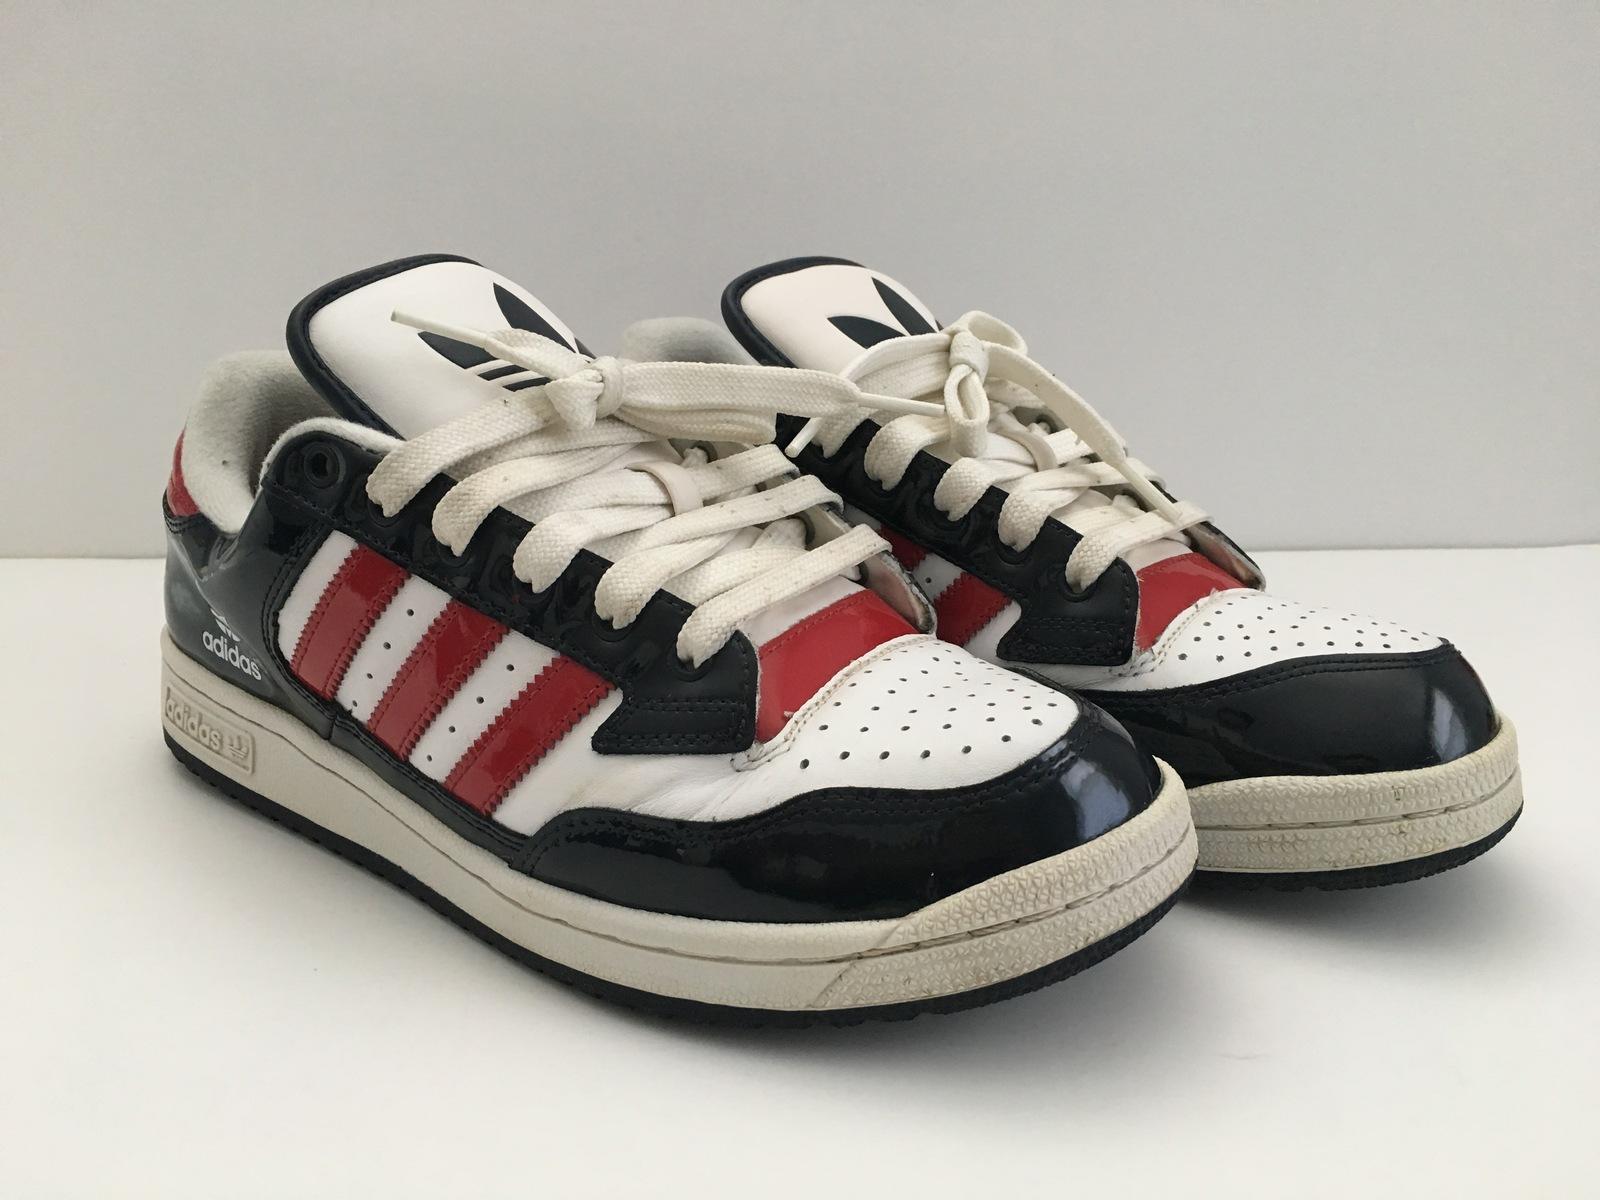 sale retailer 93186 0b357 Adidas Centennial Lo 467969 Originals Men Size 9